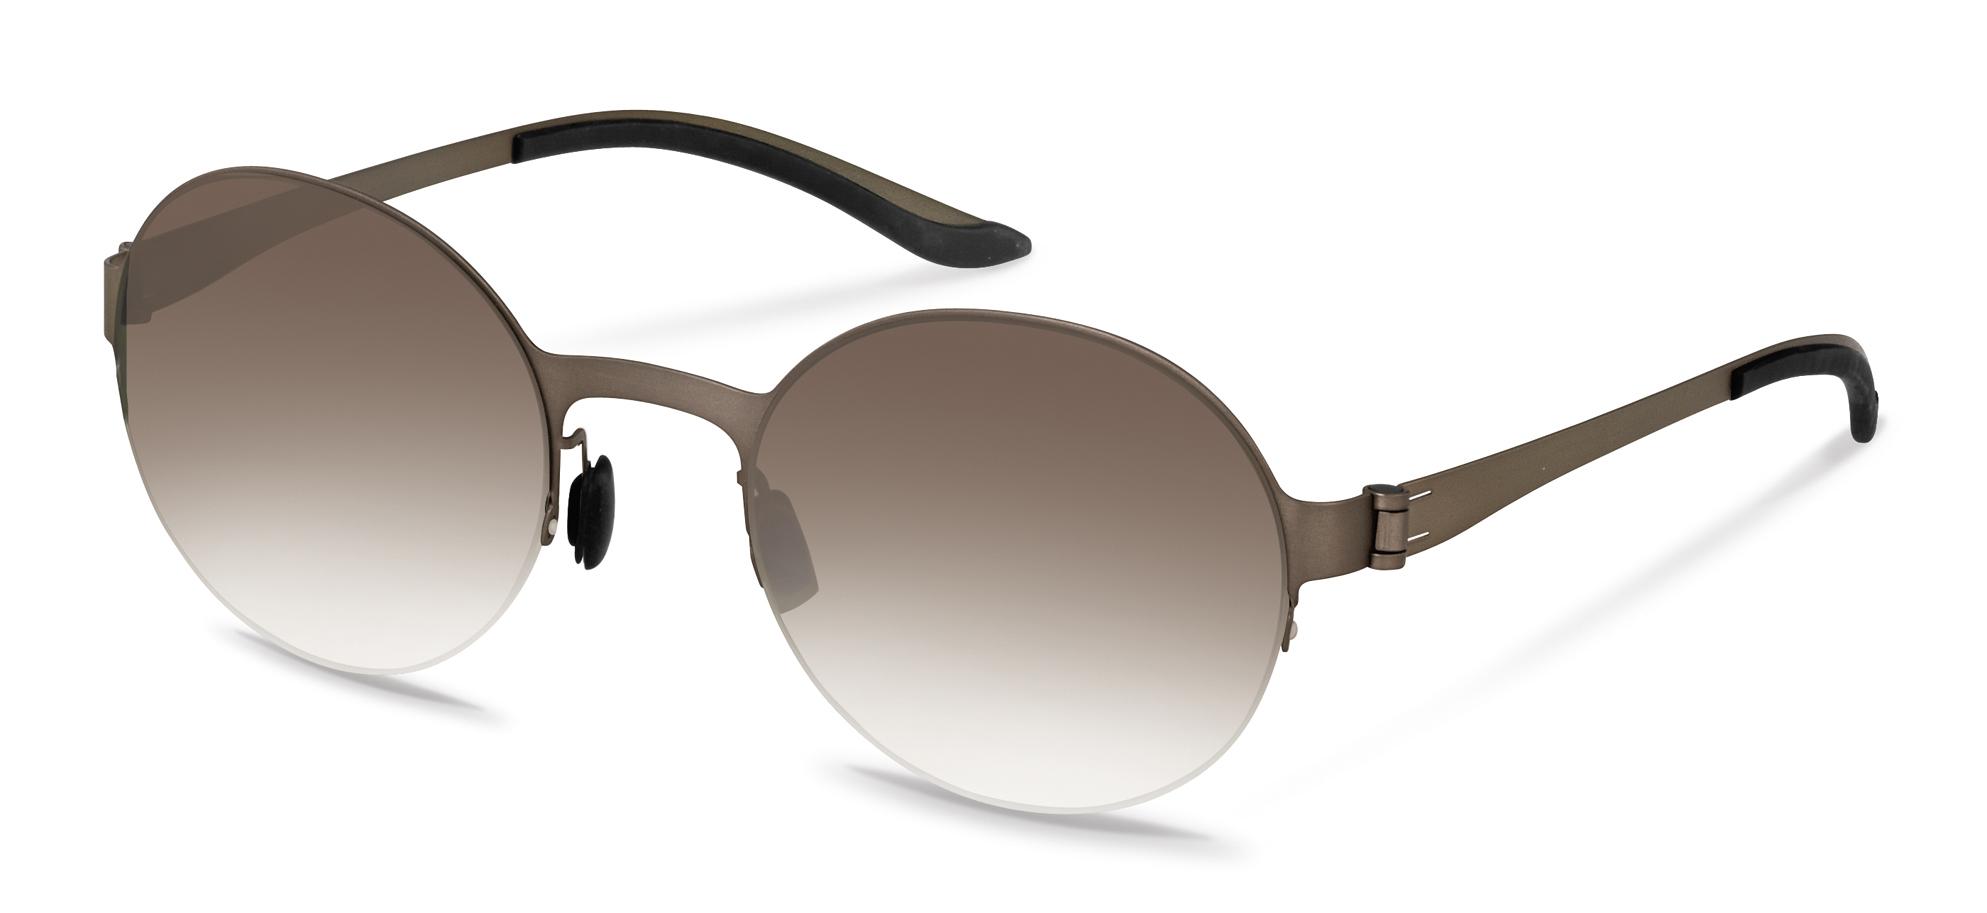 Mercedes-Benz Style Eyewear Frühjahr/Sommer 2014